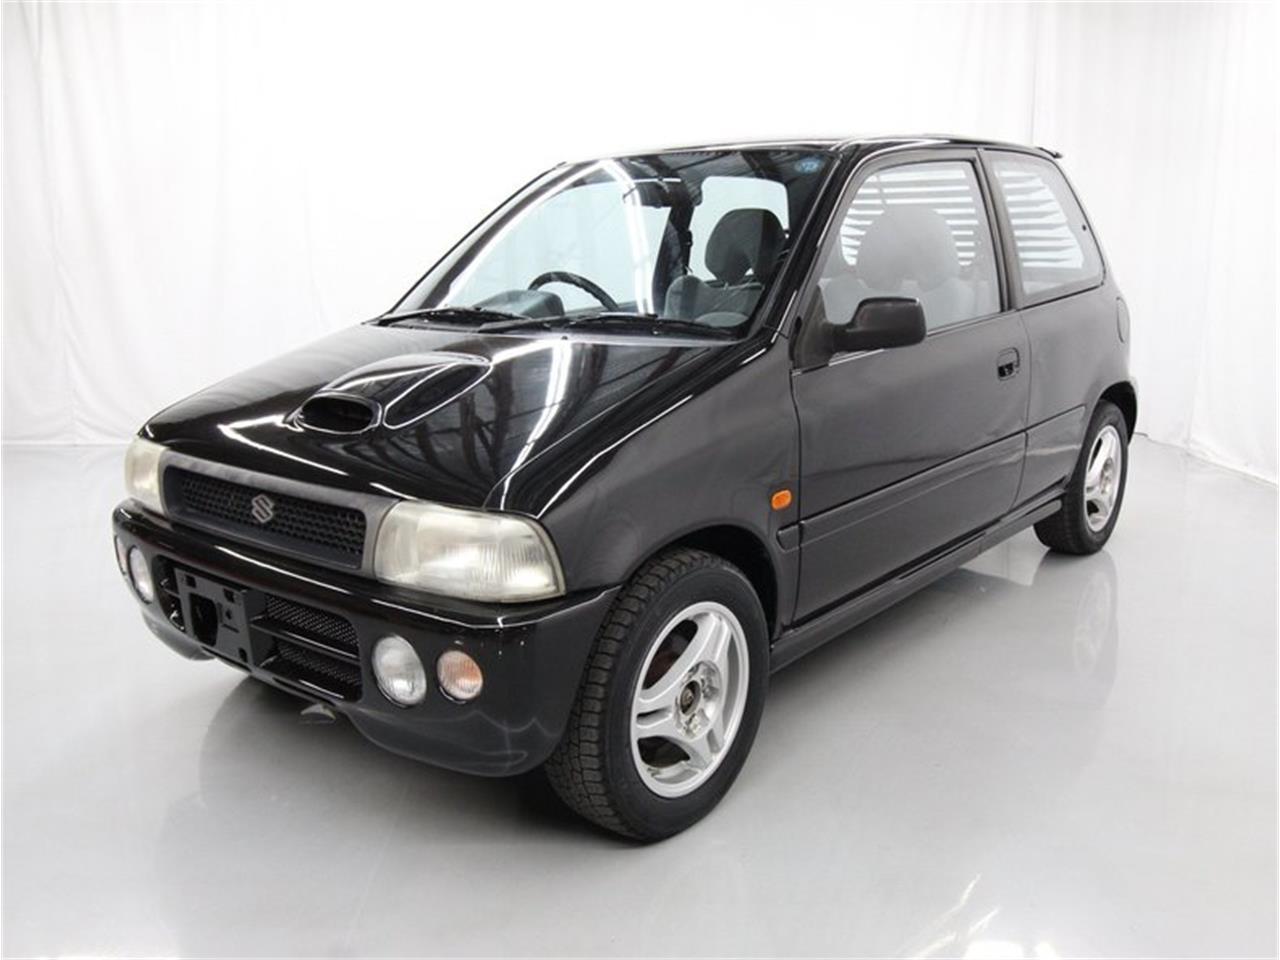 1991 Suzuki Cervo (CC-1378212) for sale in Christiansburg, Virginia